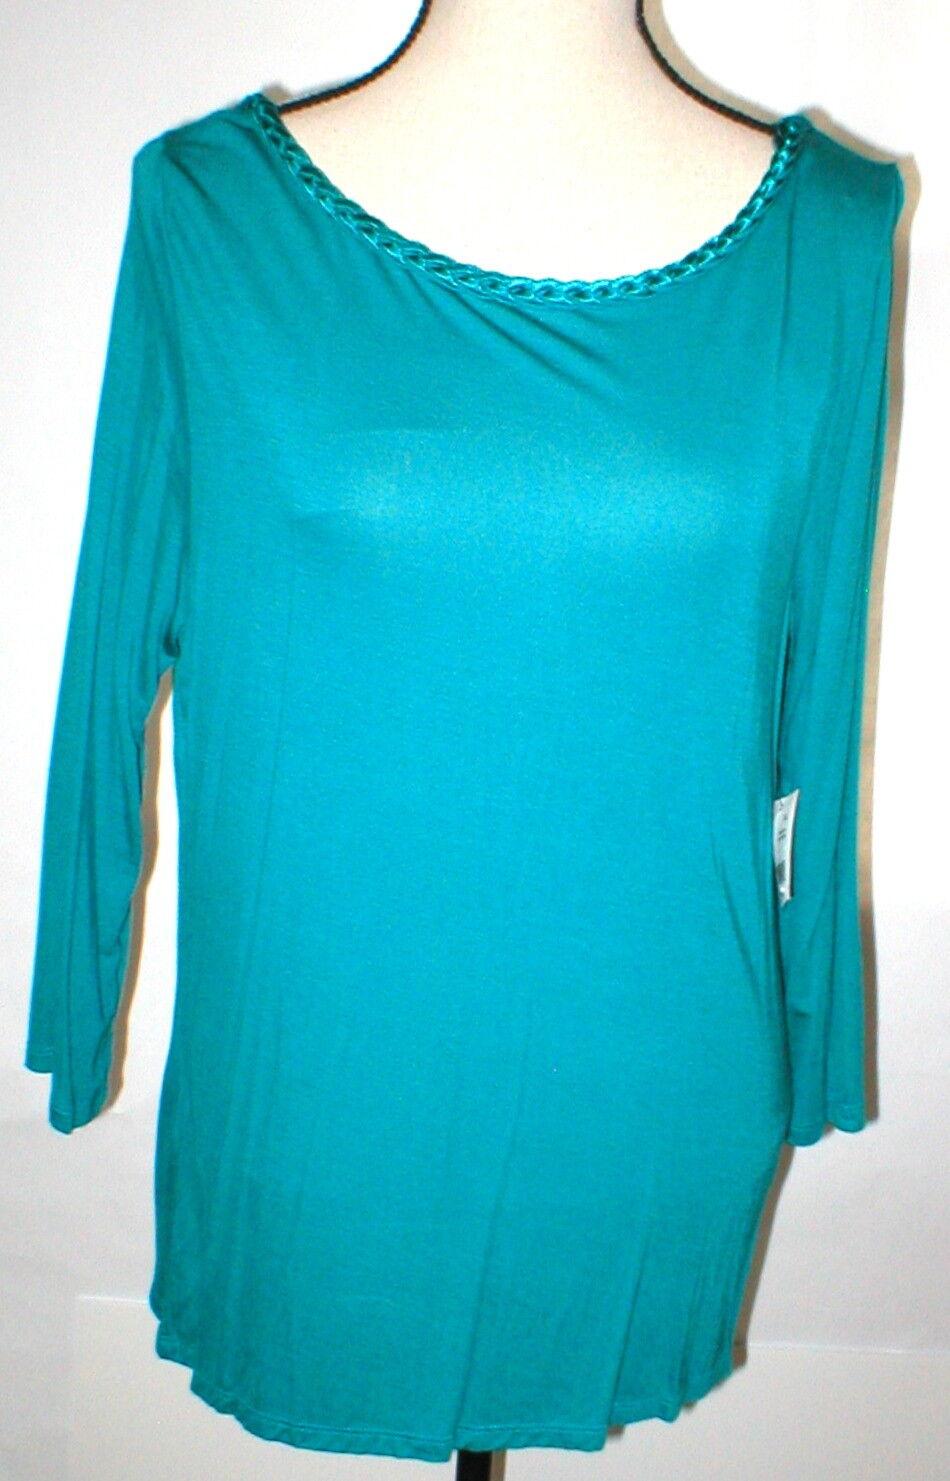 damen New Small S Aqua Blau Dark NWT  Tahari Blouse Top Braided Neck Sleeves